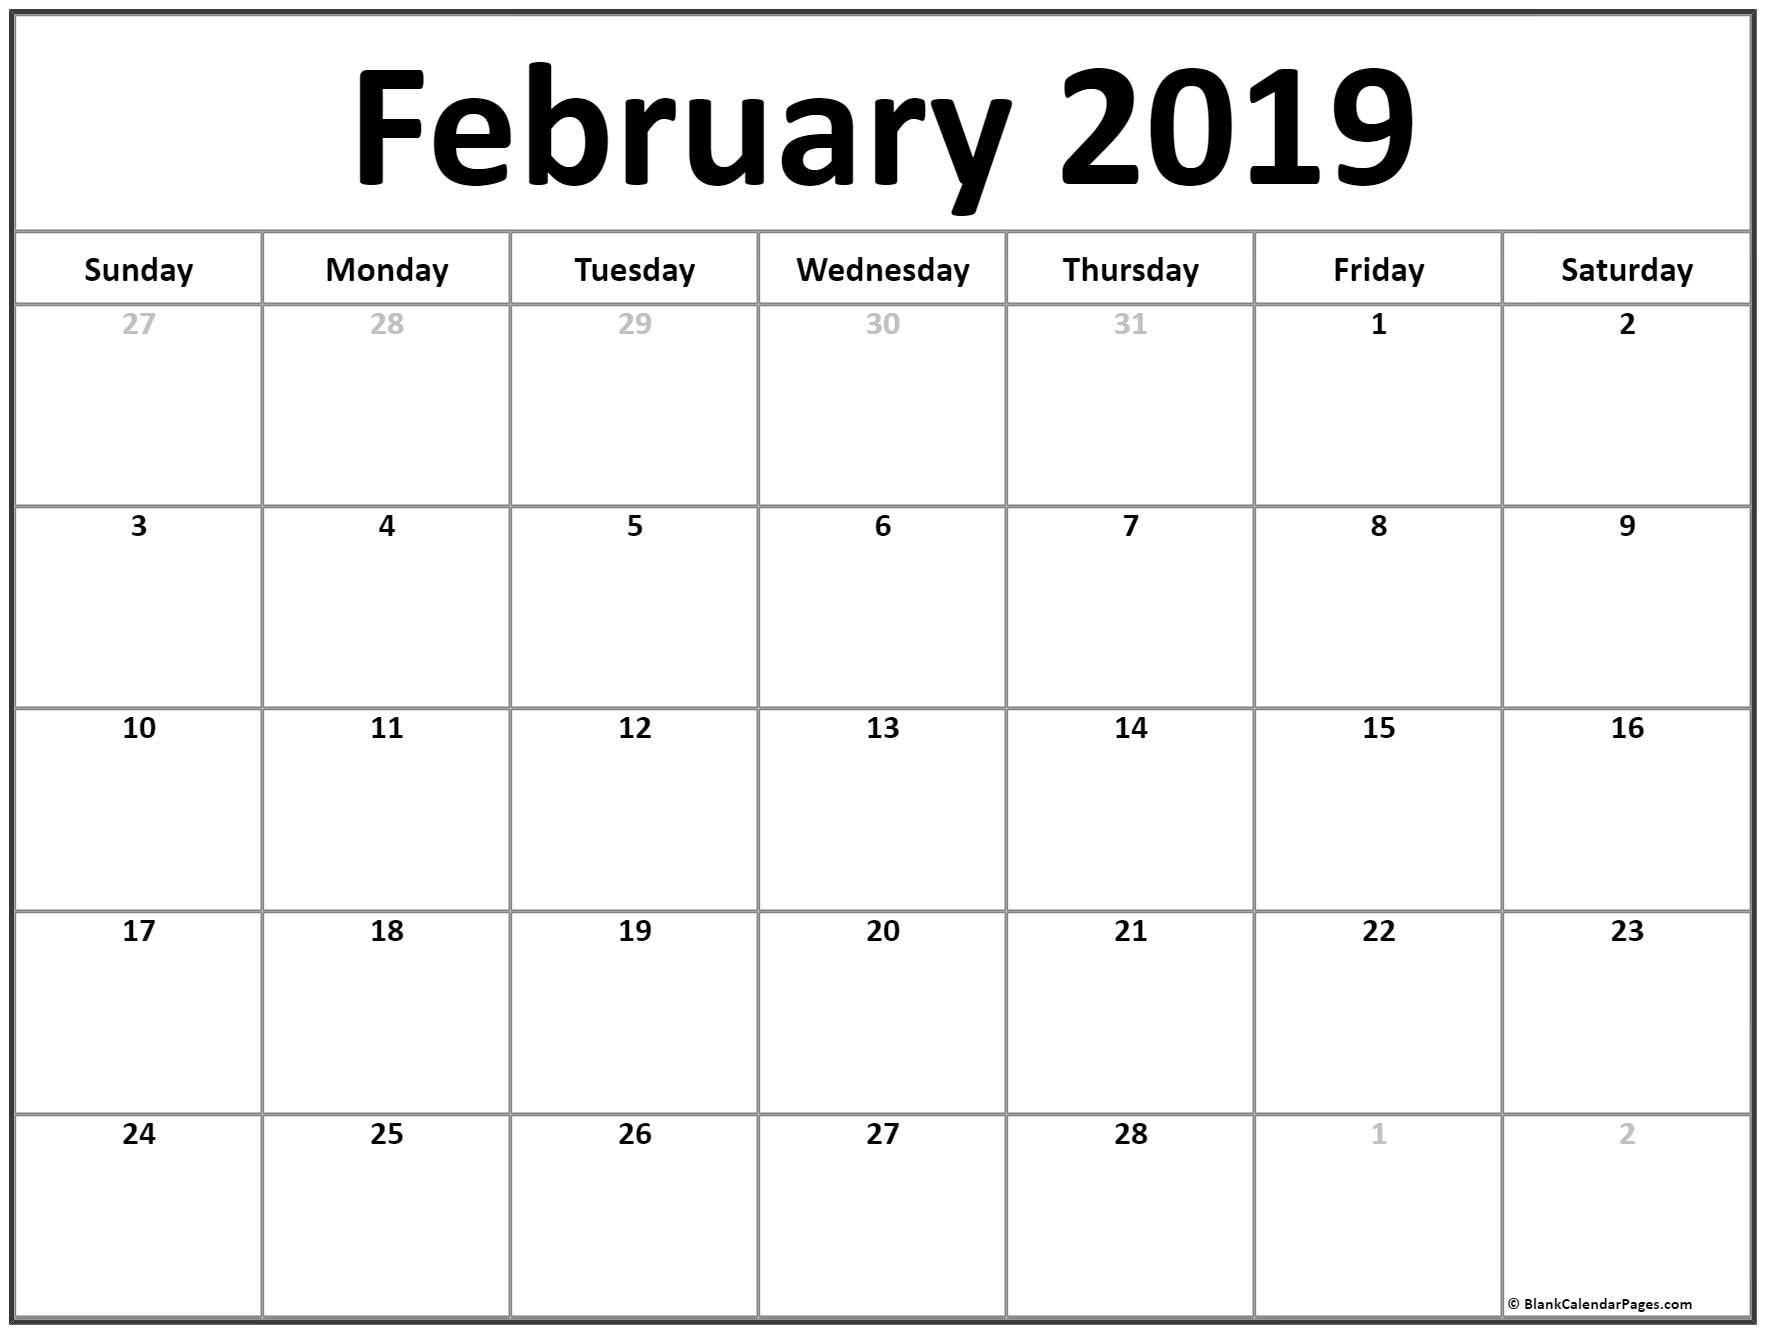 Feb Calendar 2019.Printable Feb 2019 Calendar February 2019 Calendar Printable